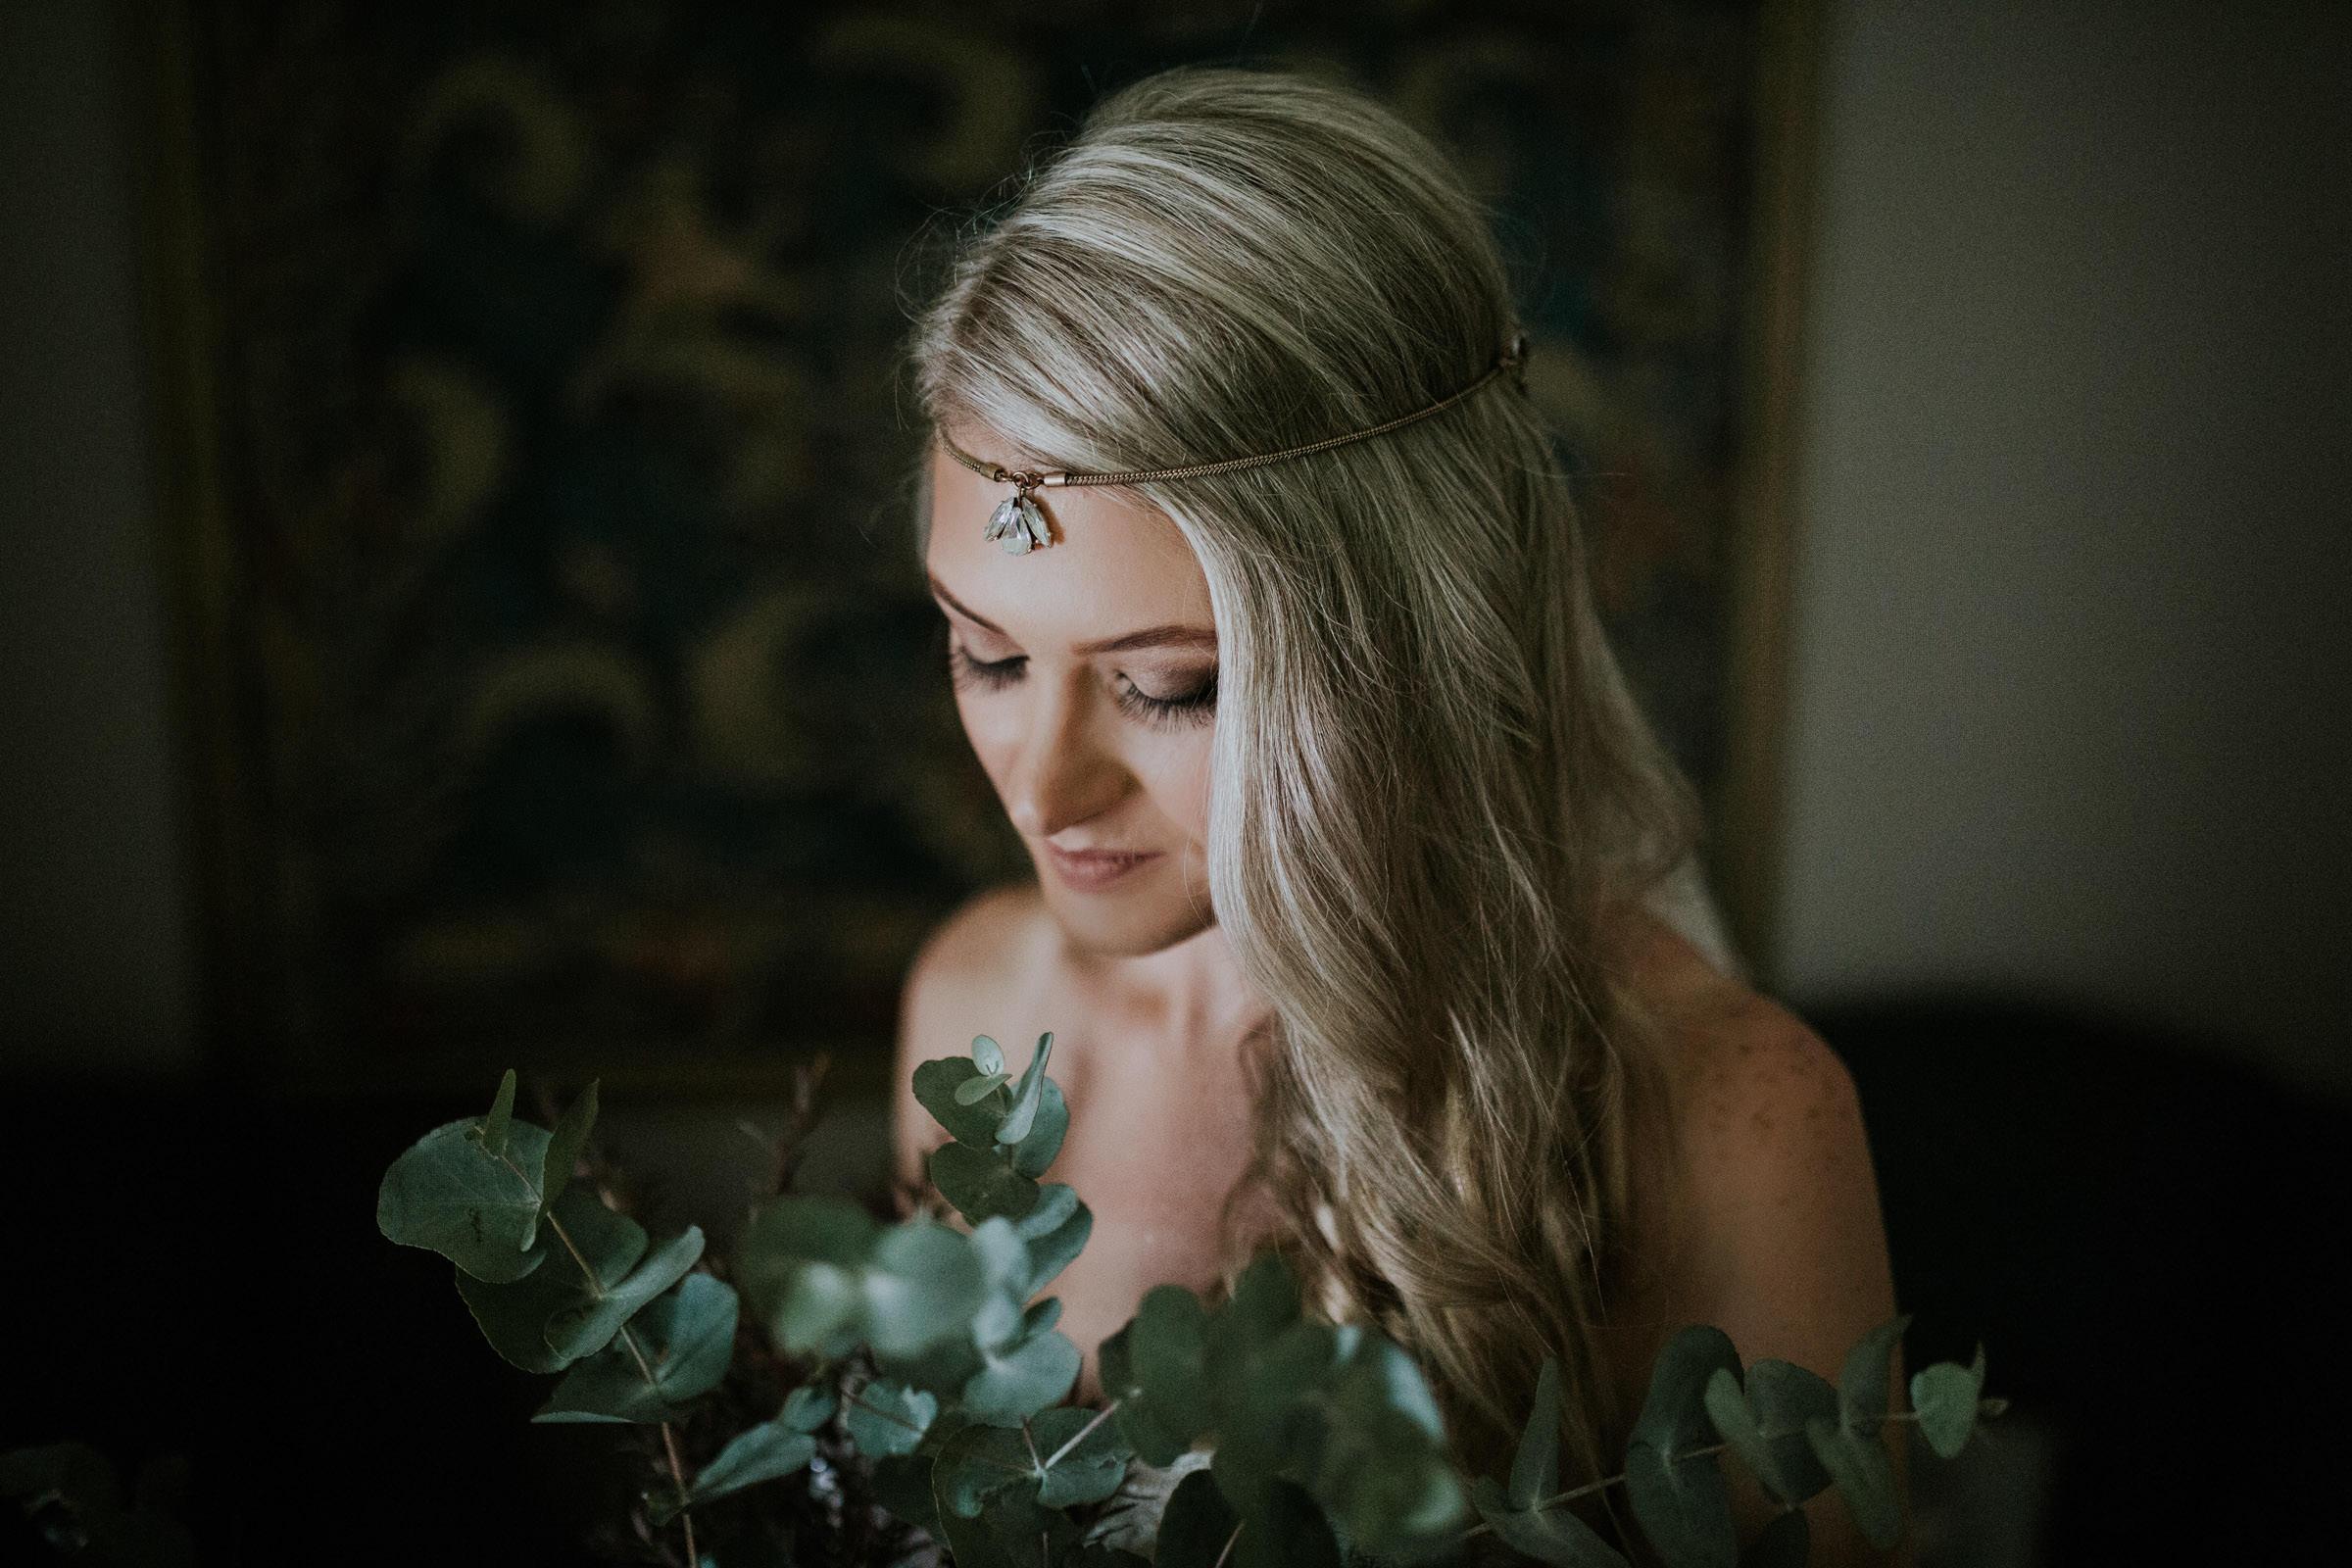 Emma+John+Far+South+Coast+Wedding+Festivl+Glamping+Bush-54.jpg